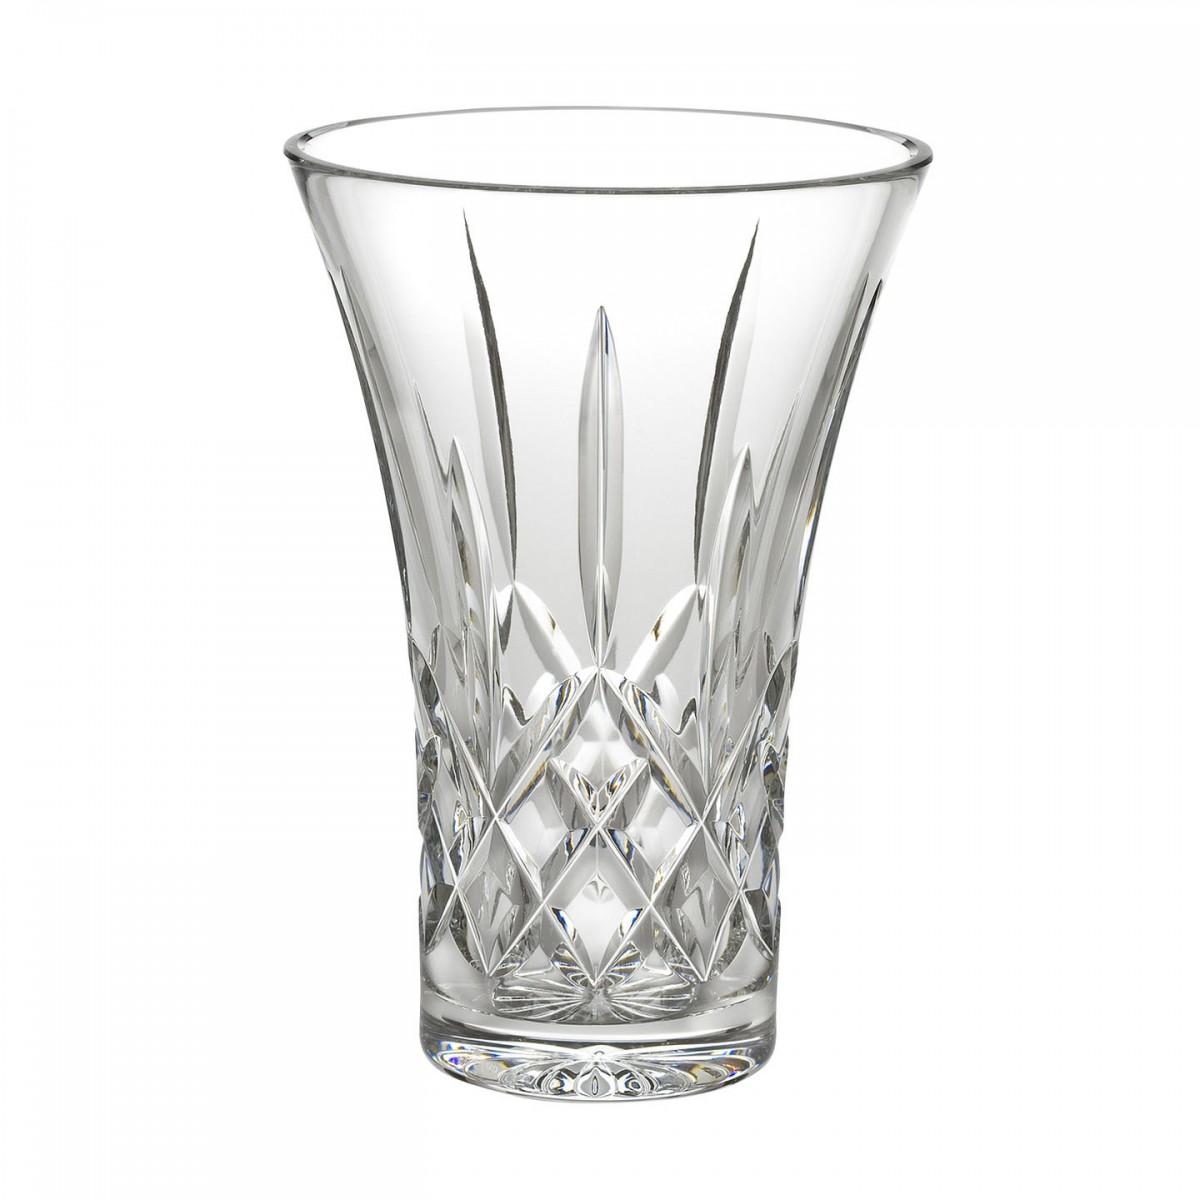 Vases lijo decor waterford lismore 8 flared vase reviewsmspy